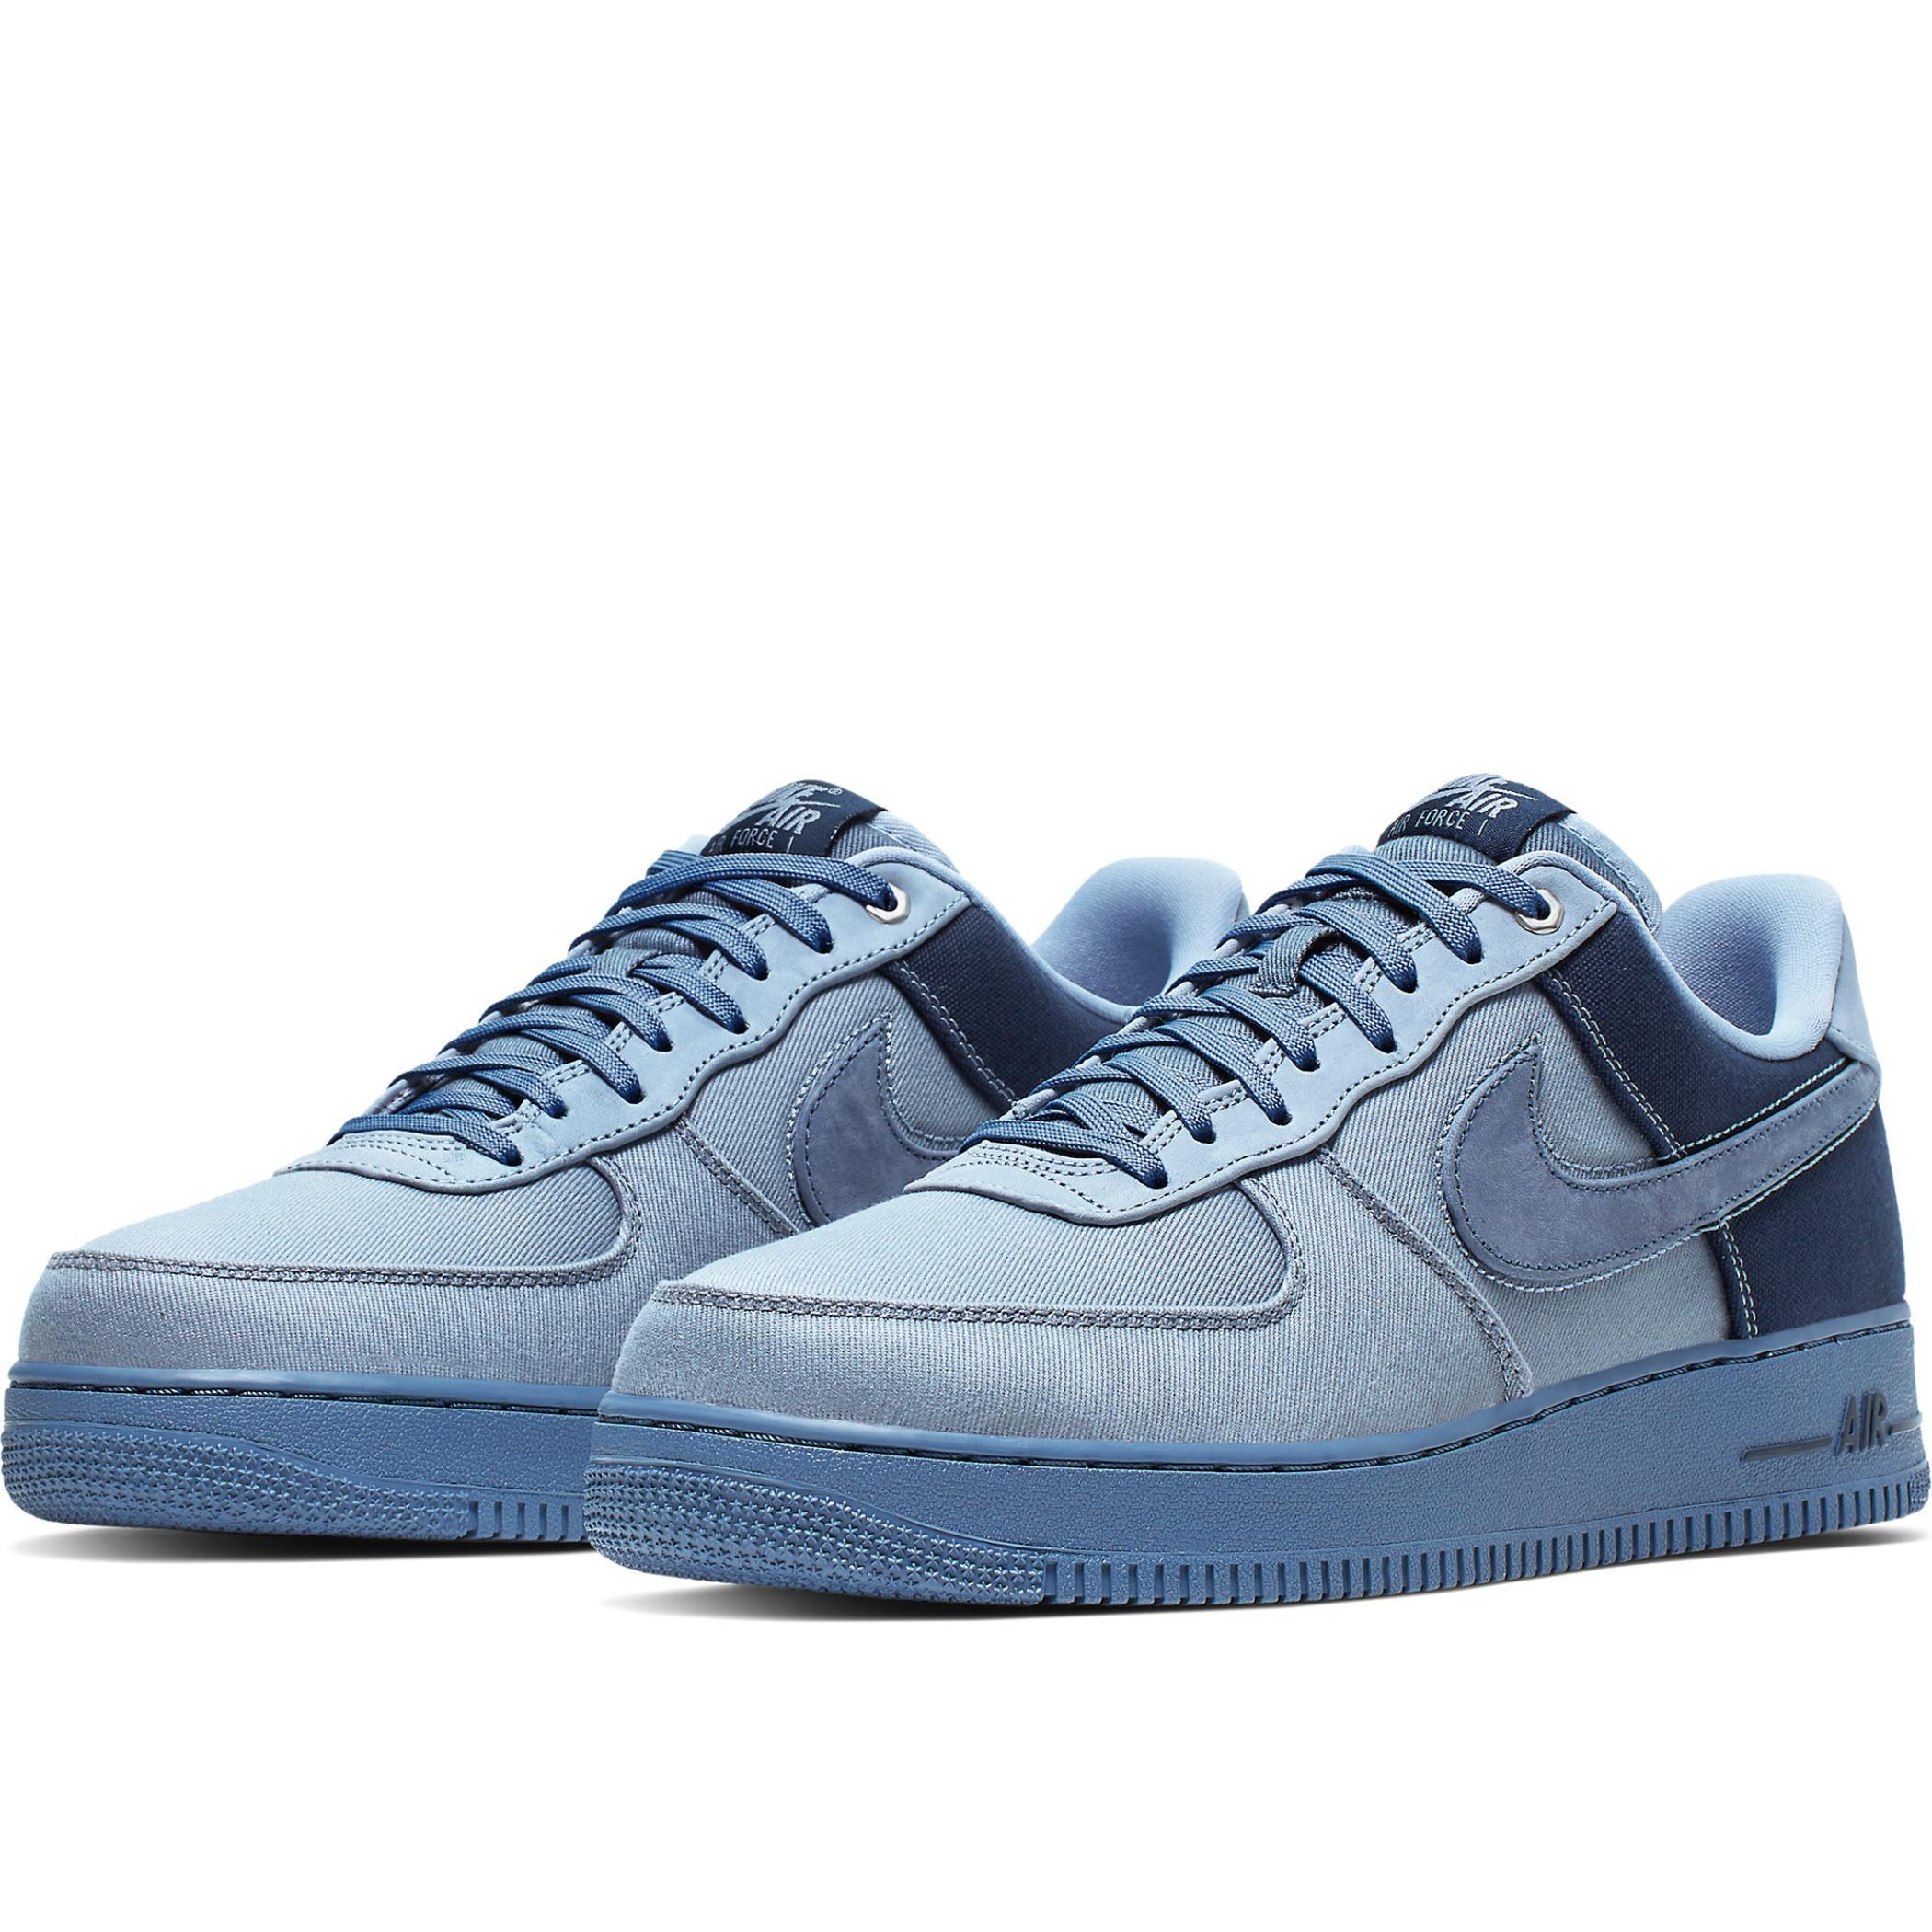 Nike Air Force 1 '07 PRM 3 Ashen SlateDiffused Blue